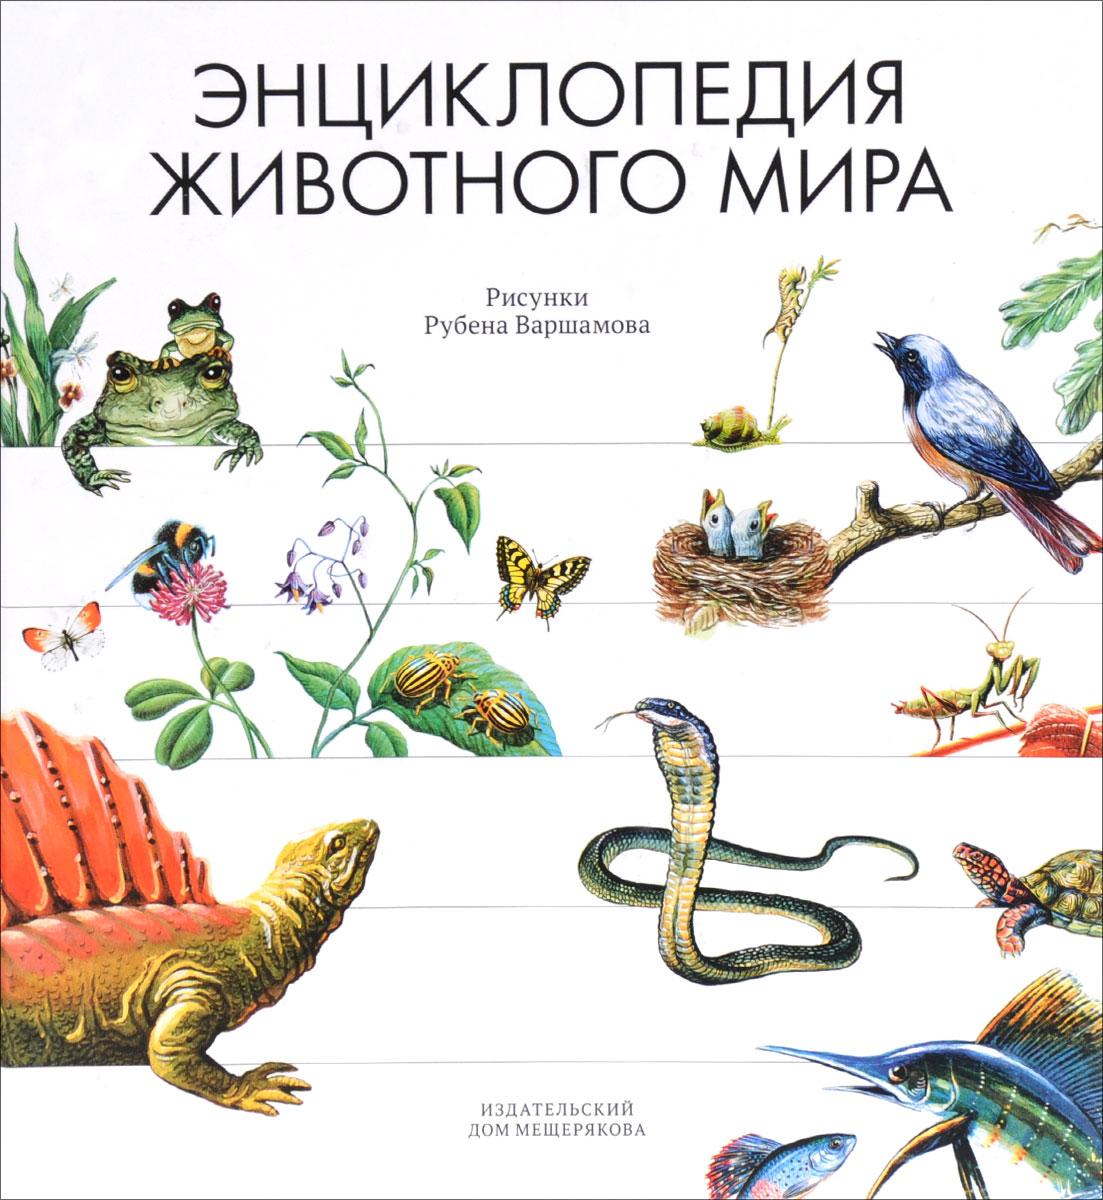 Энциклопедия животного мира, Александрова Э.